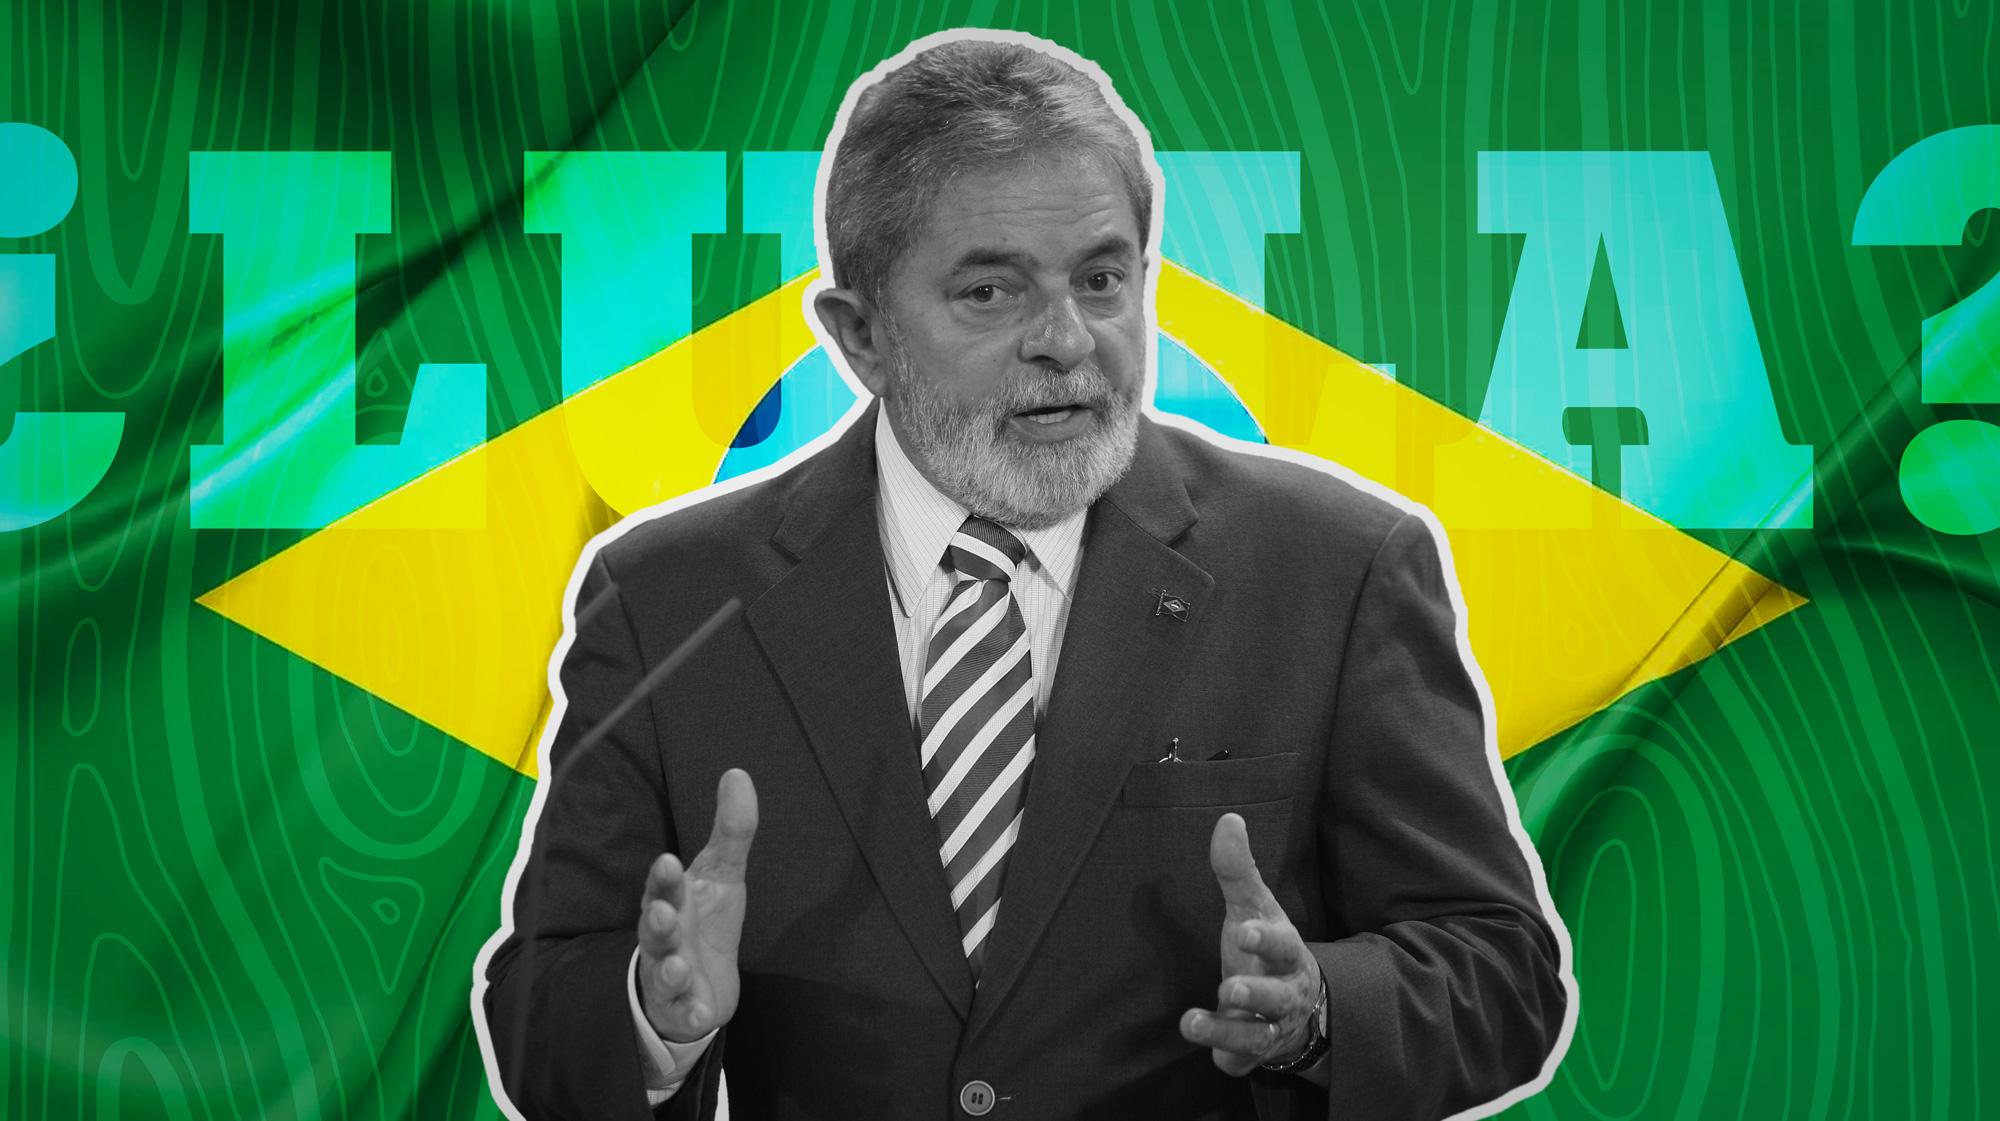 Podrá Lula ser candidato?